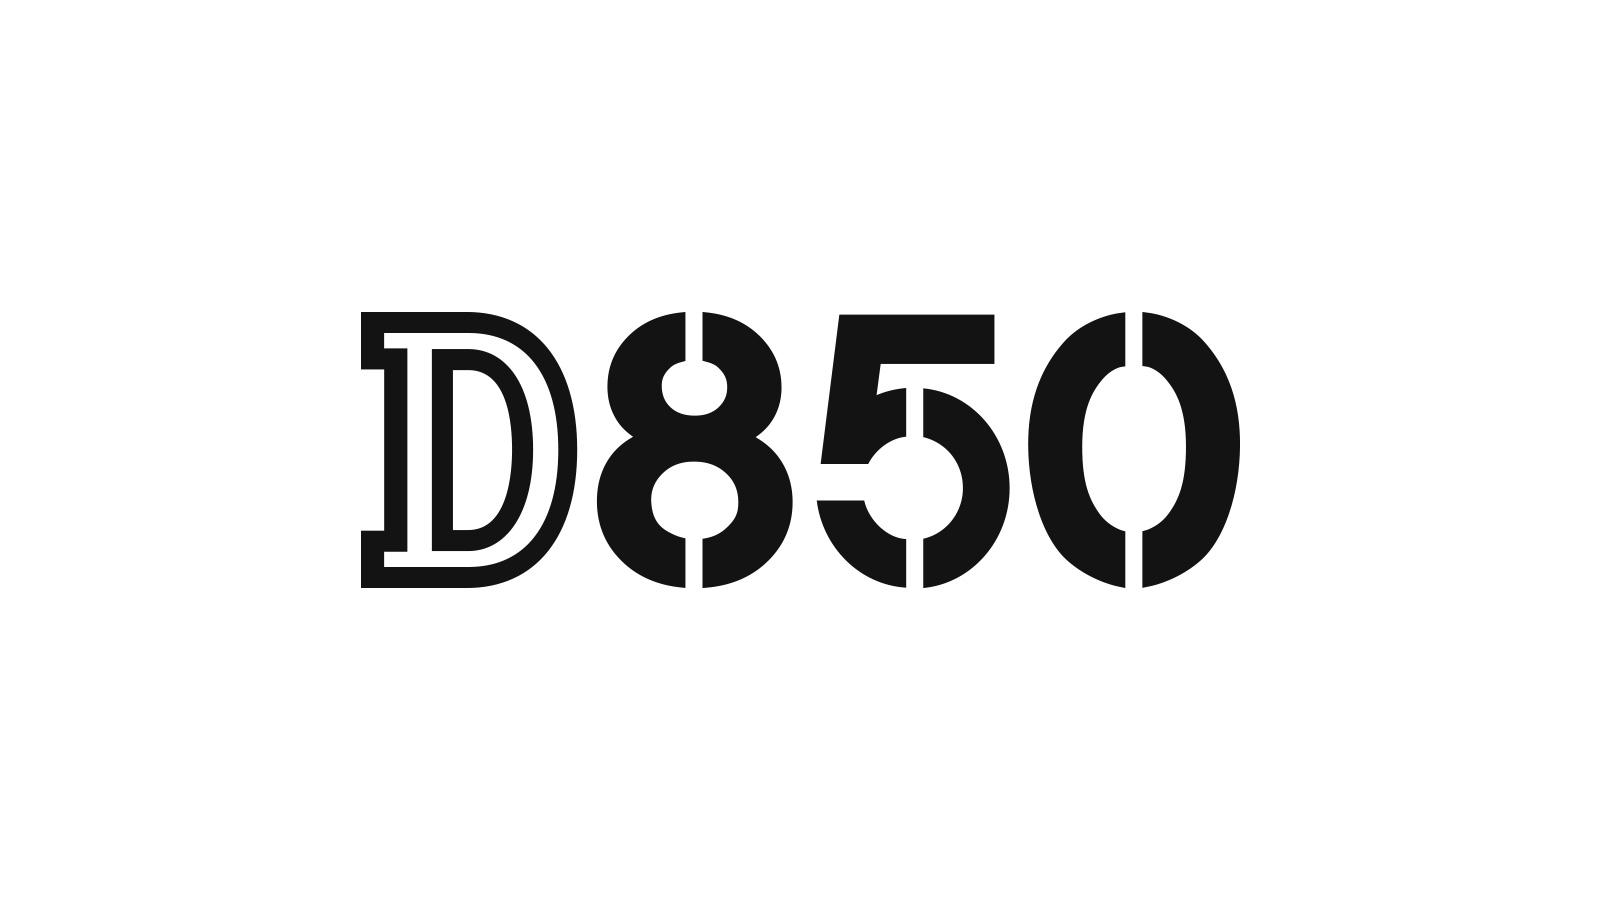 Nikon Developing Next-Gen, Full-Frame D850